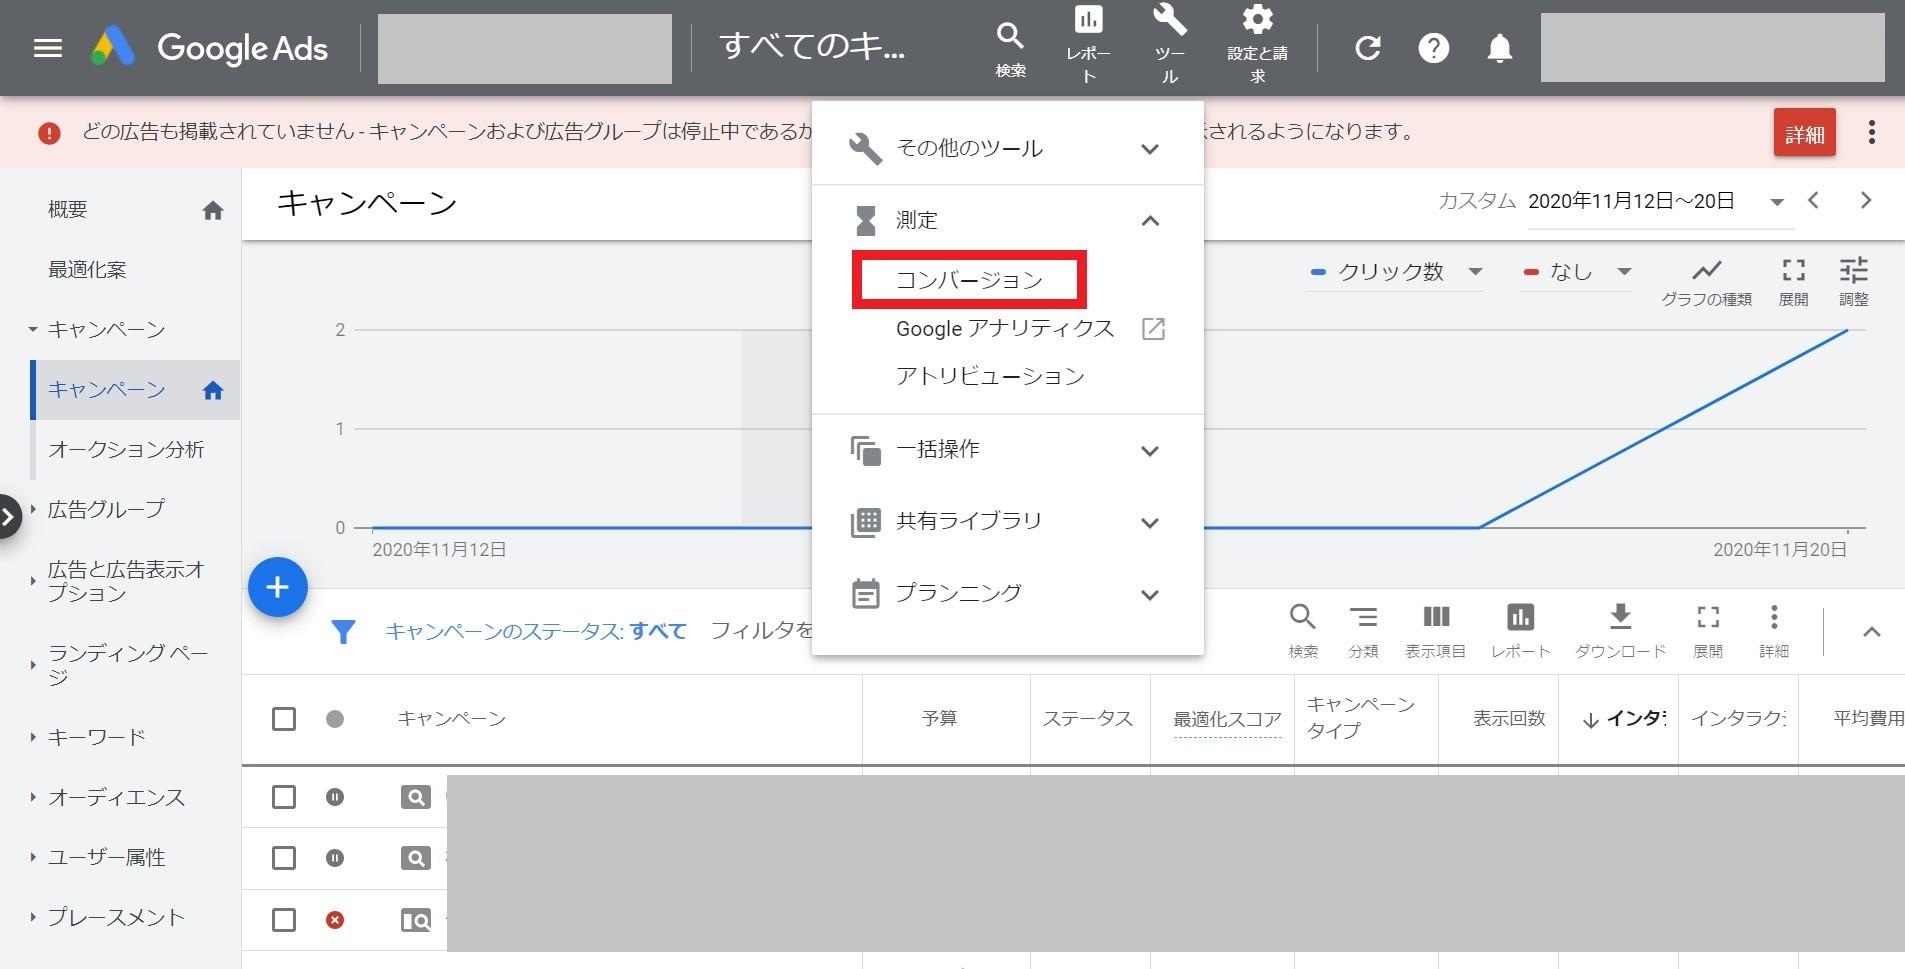 Google広告のコンバージョン測定